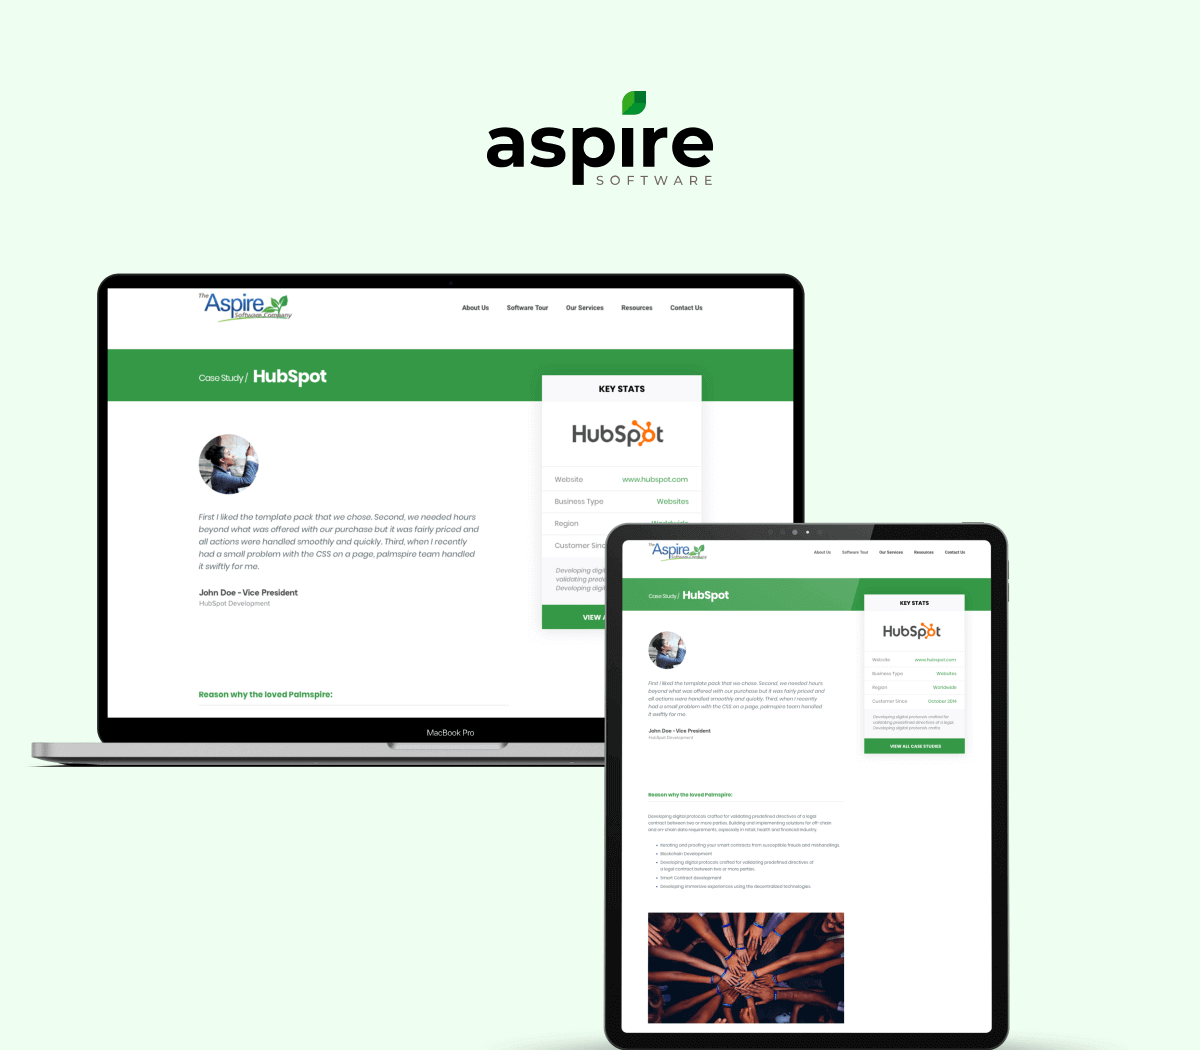 The Aspire